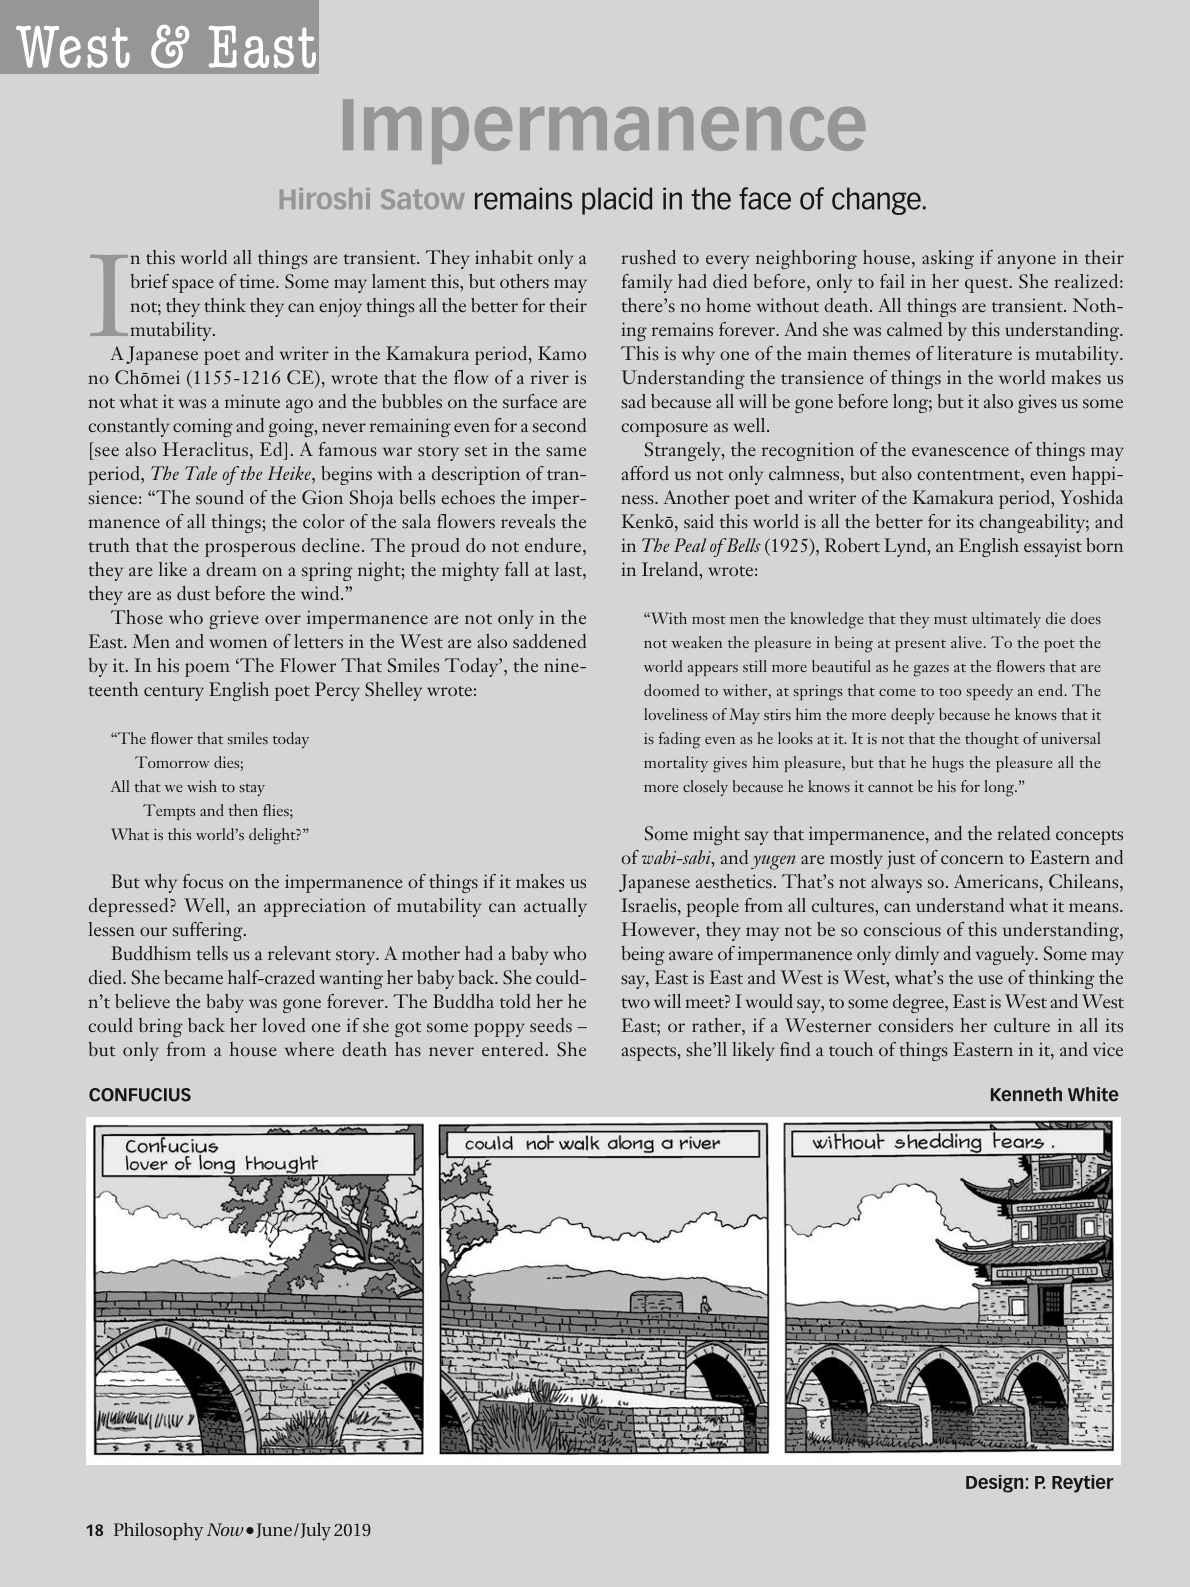 Impermanence - Hiroshi Satow - Philosophy Now (Philosophy